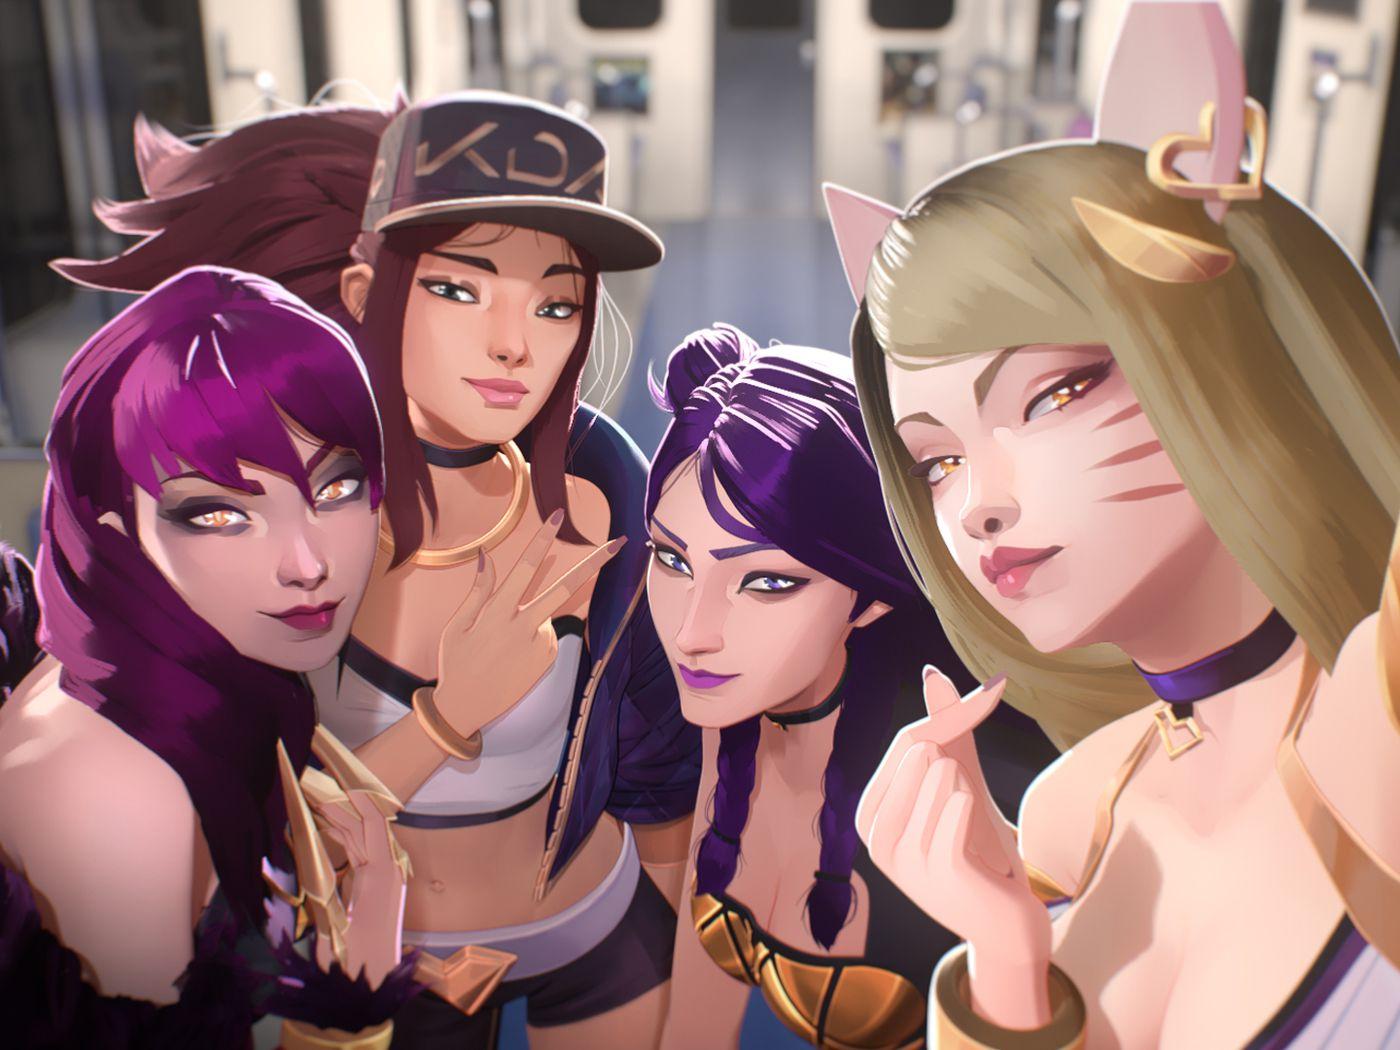 K Da League Of Legends Pop Girl Group Explained Polygon